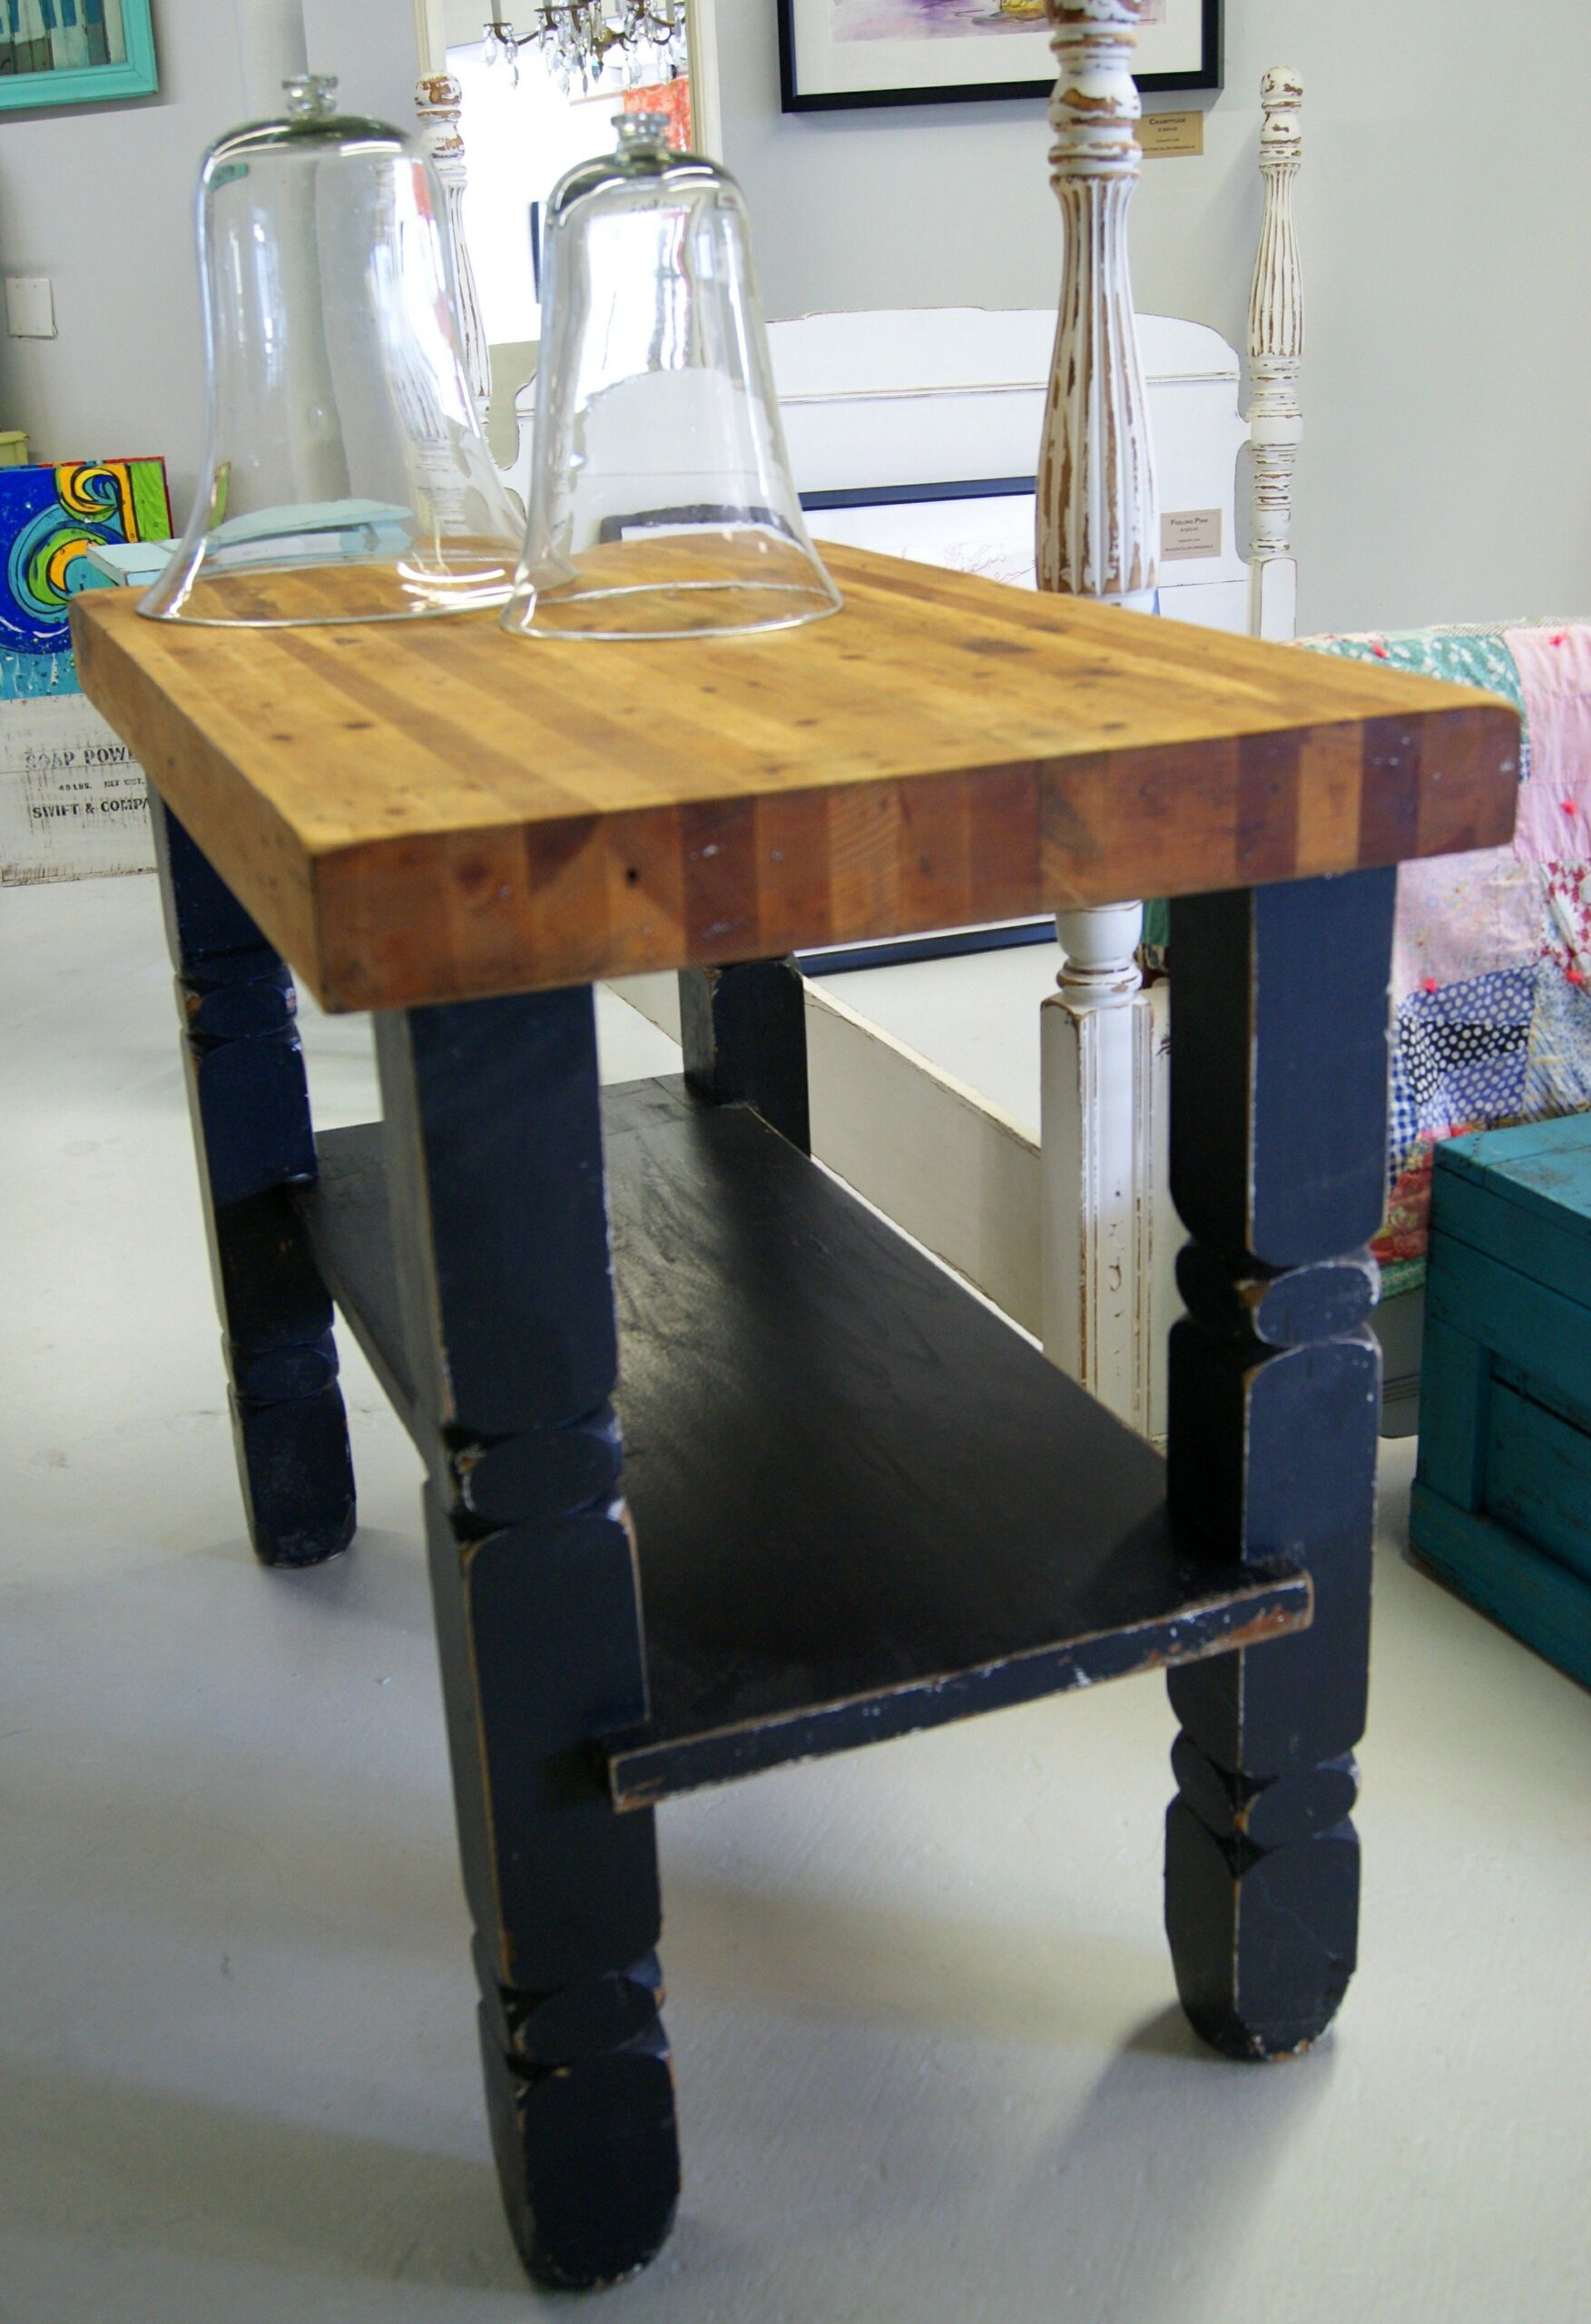 Full Size of Kche Arbeitstisch Beeketal Gastro Tisch Zerlegetisch Wohnzimmer Beeketal Zerlegetisch